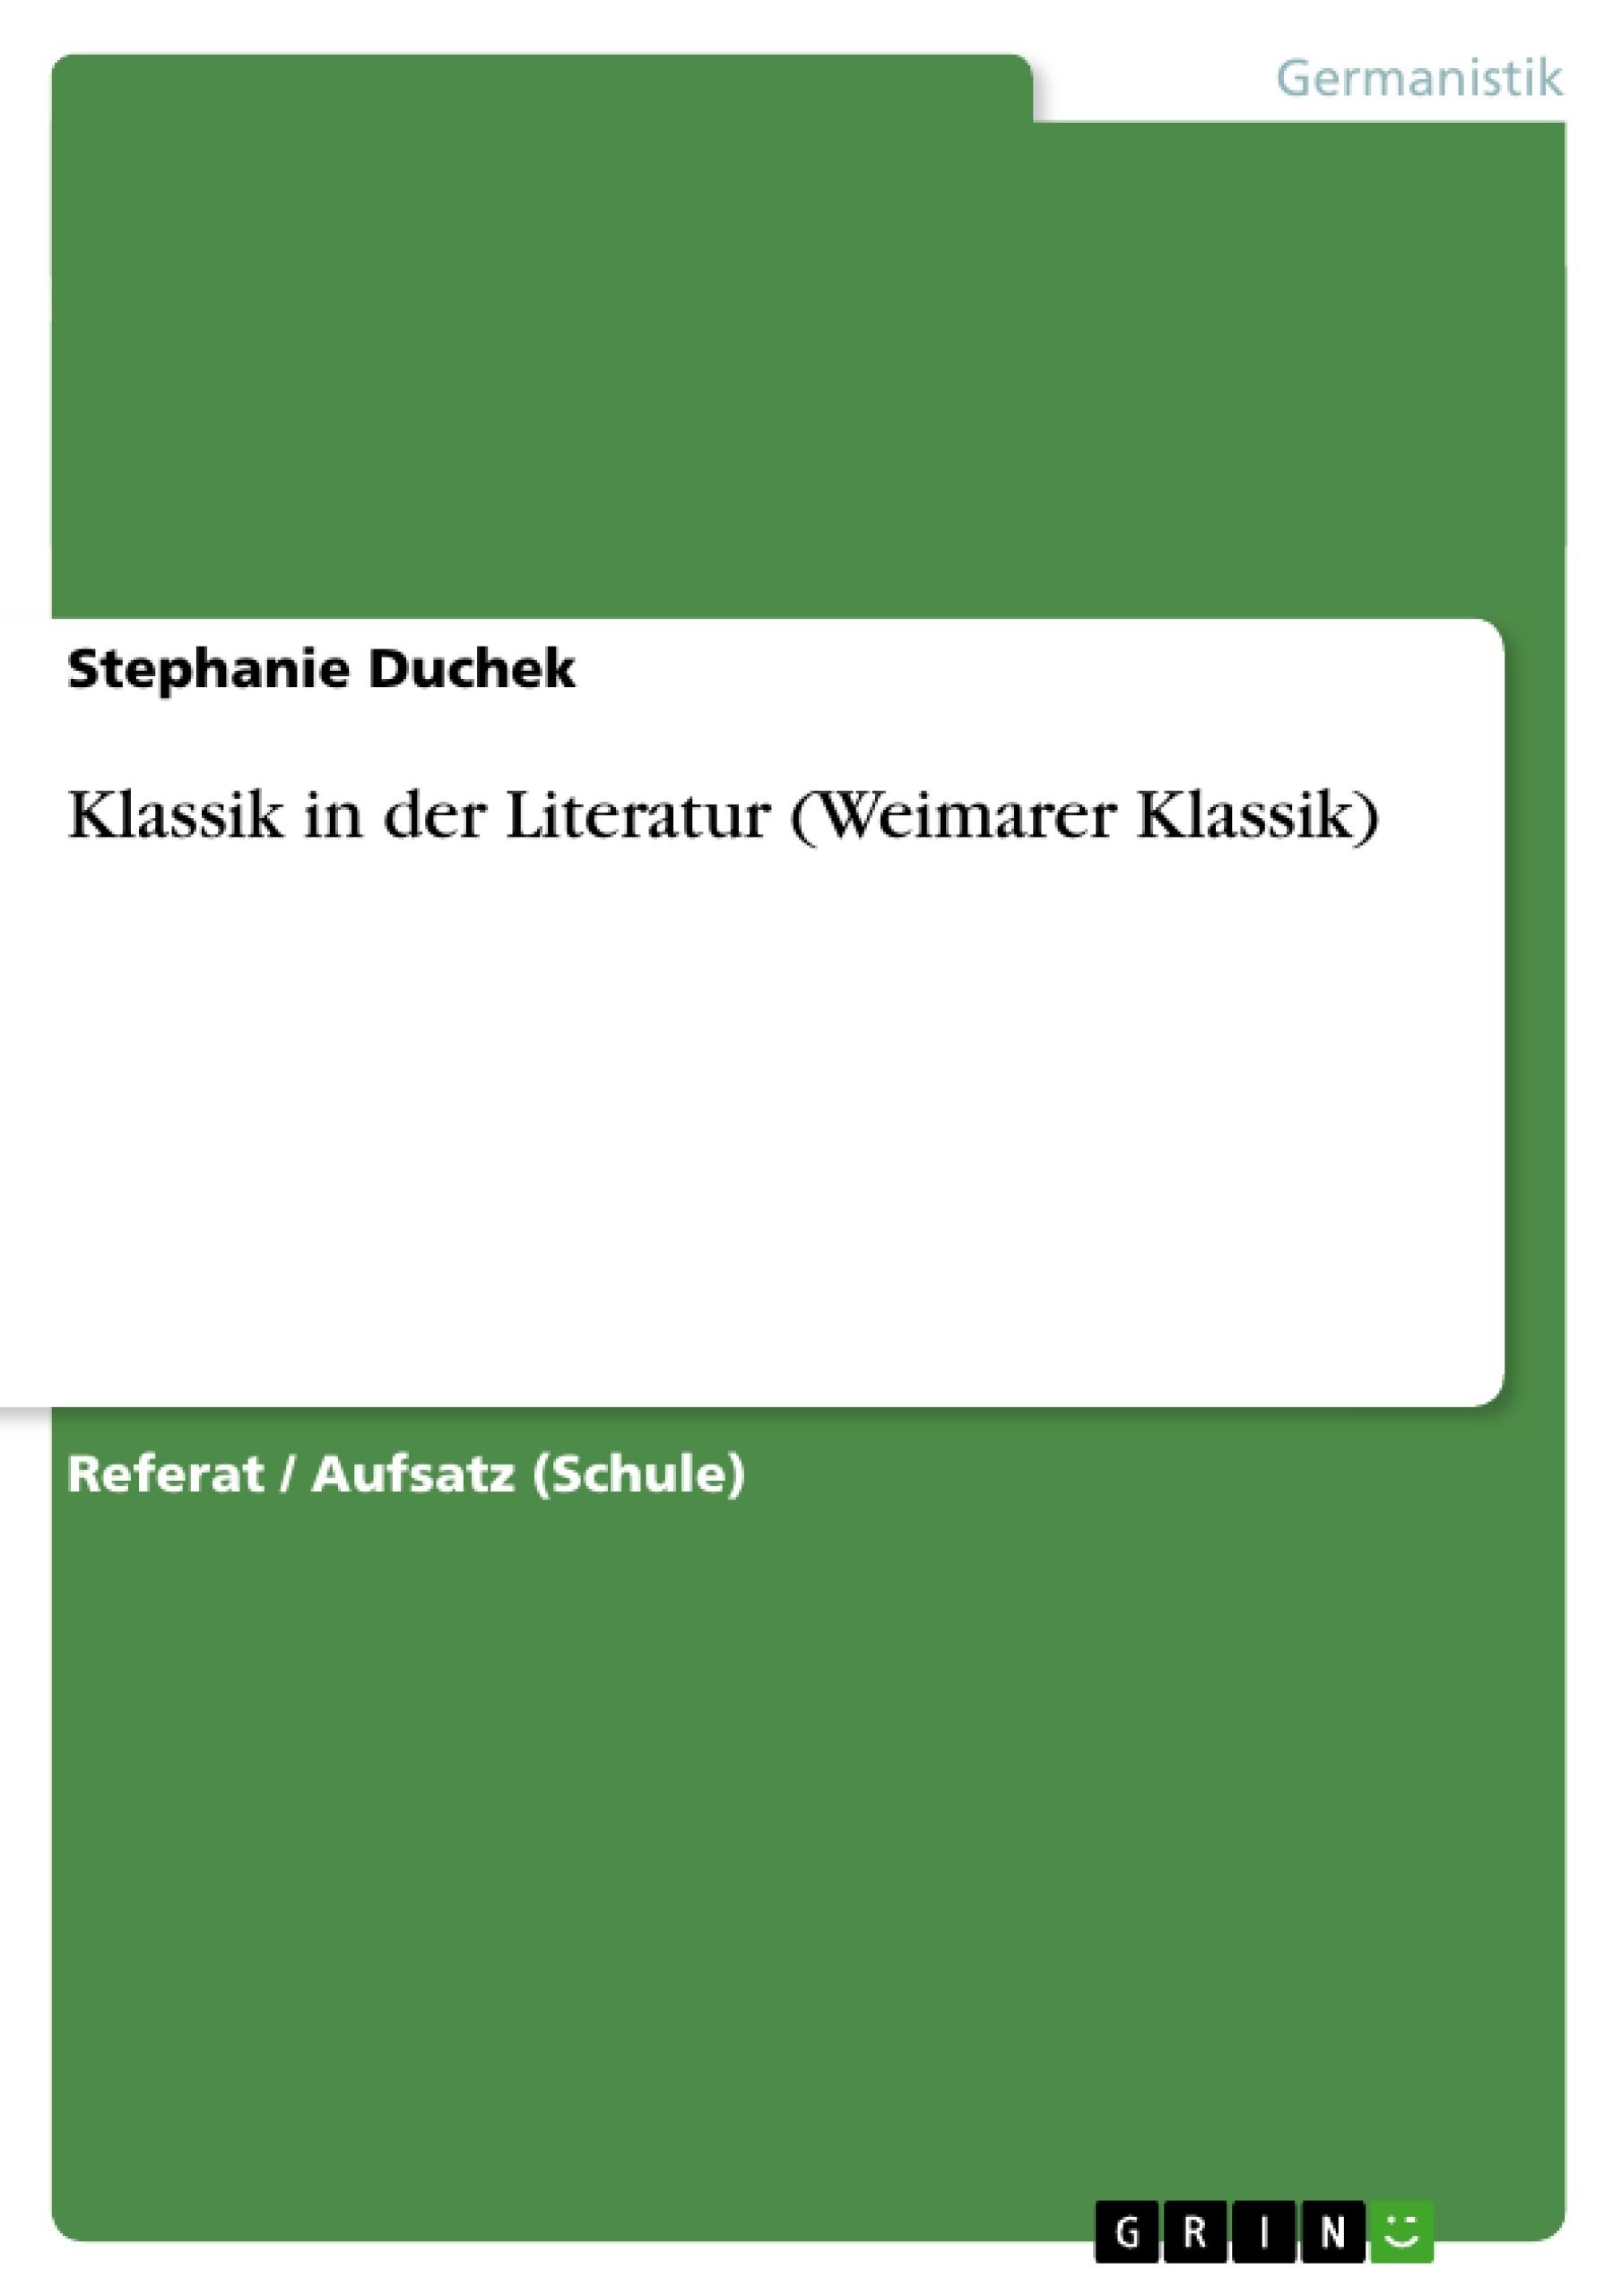 Titel: Klassik in der Literatur (Weimarer Klassik)